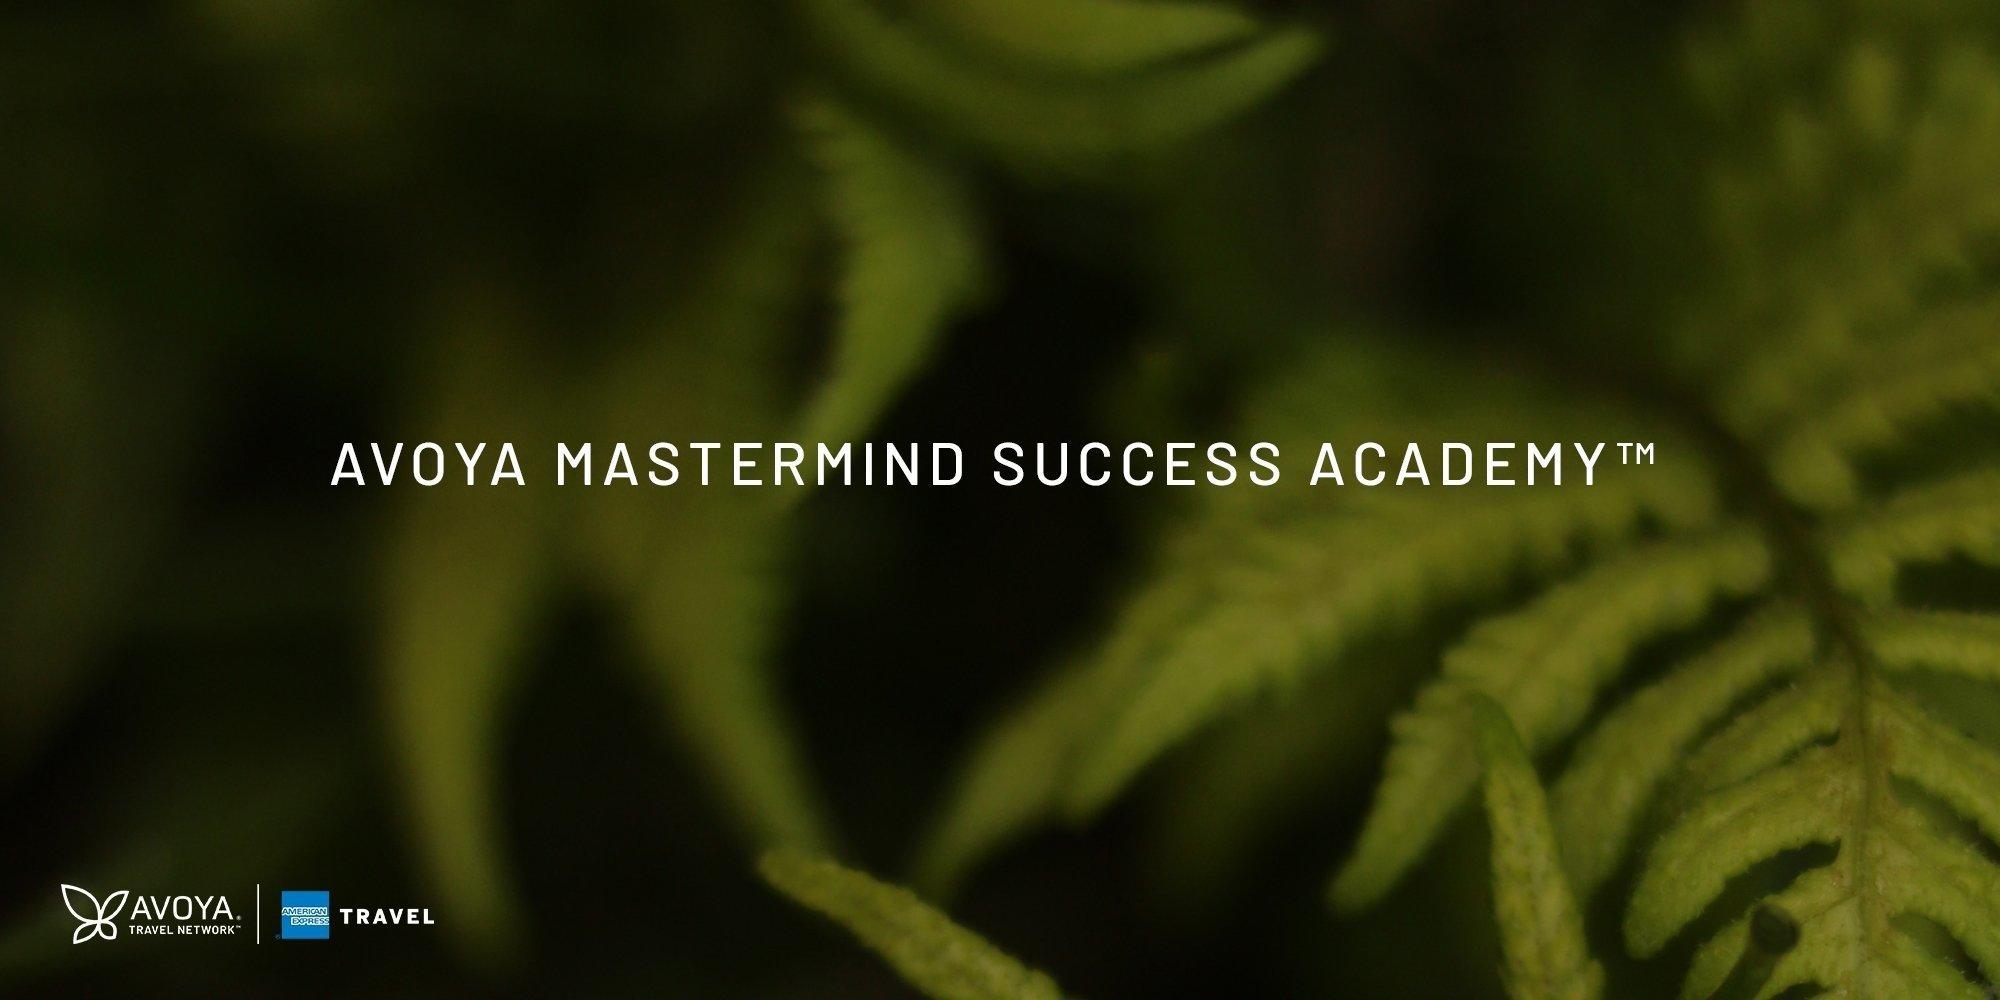 Quebec City, Canada: Avoya Mastermind Success Academy™